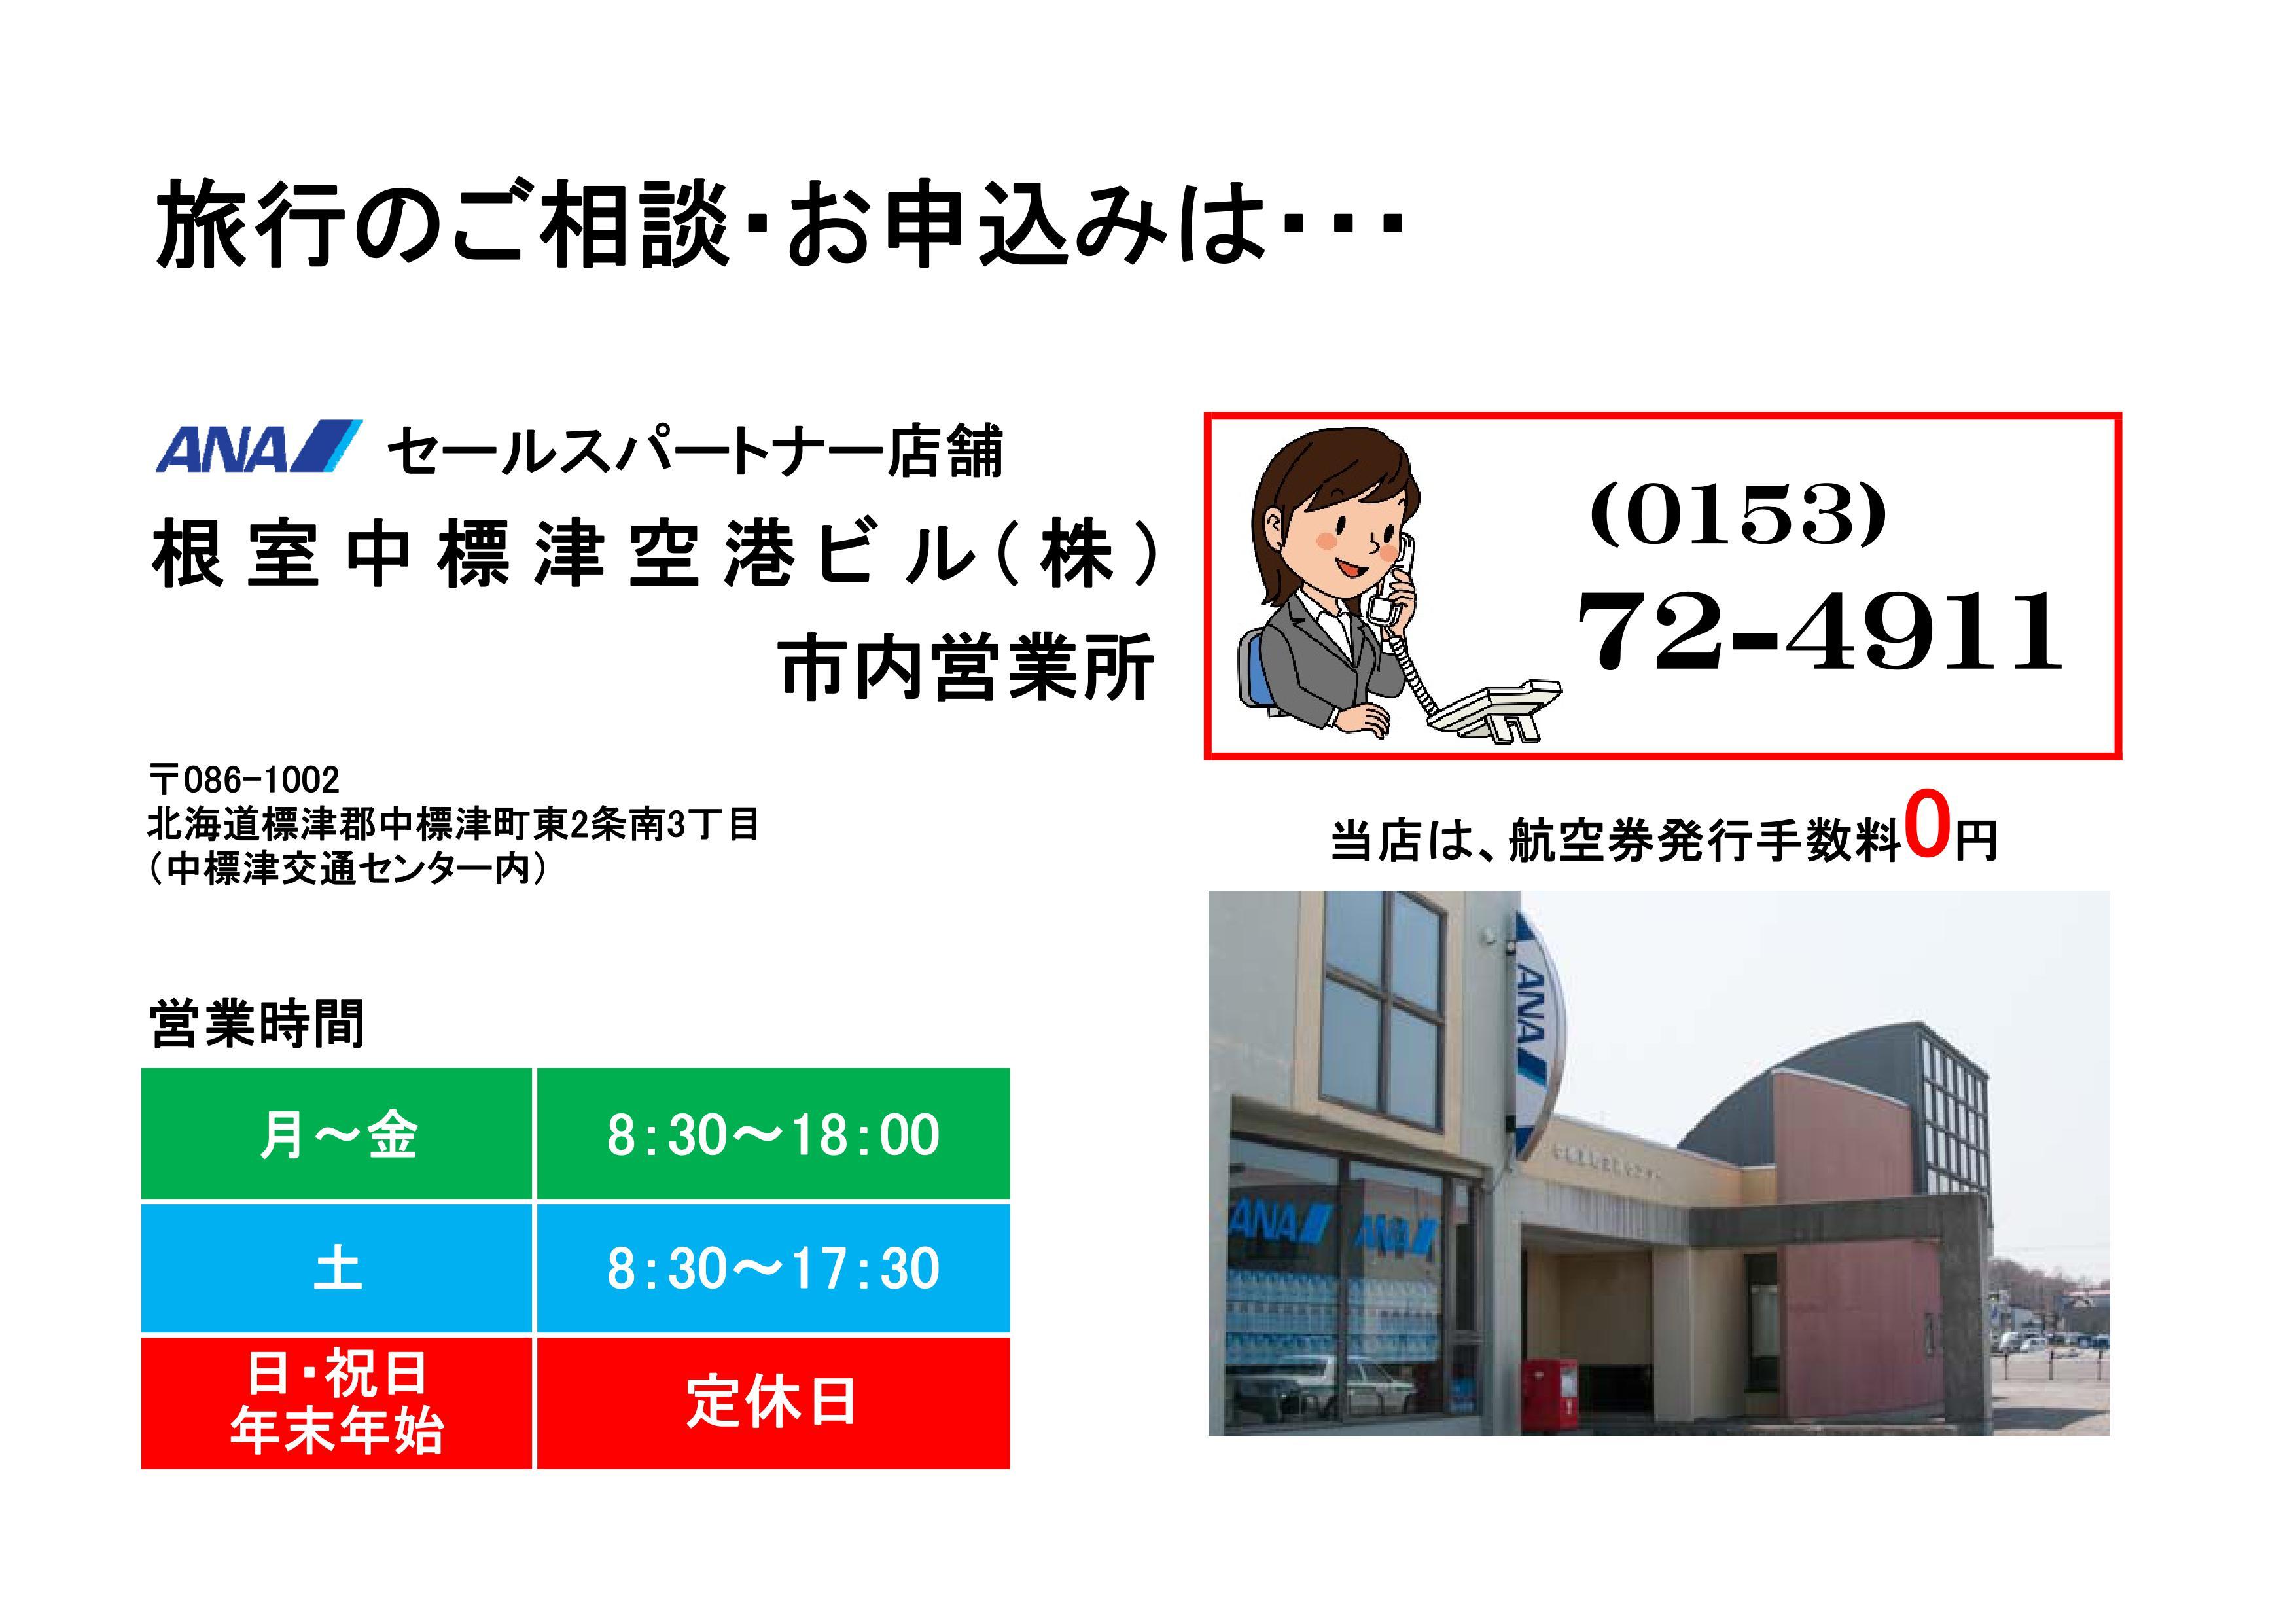 http://www.nakashibetsu-airport.jp/%E5%96%B6%E6%A5%AD%E6%99%82%E9%96%93.jpg